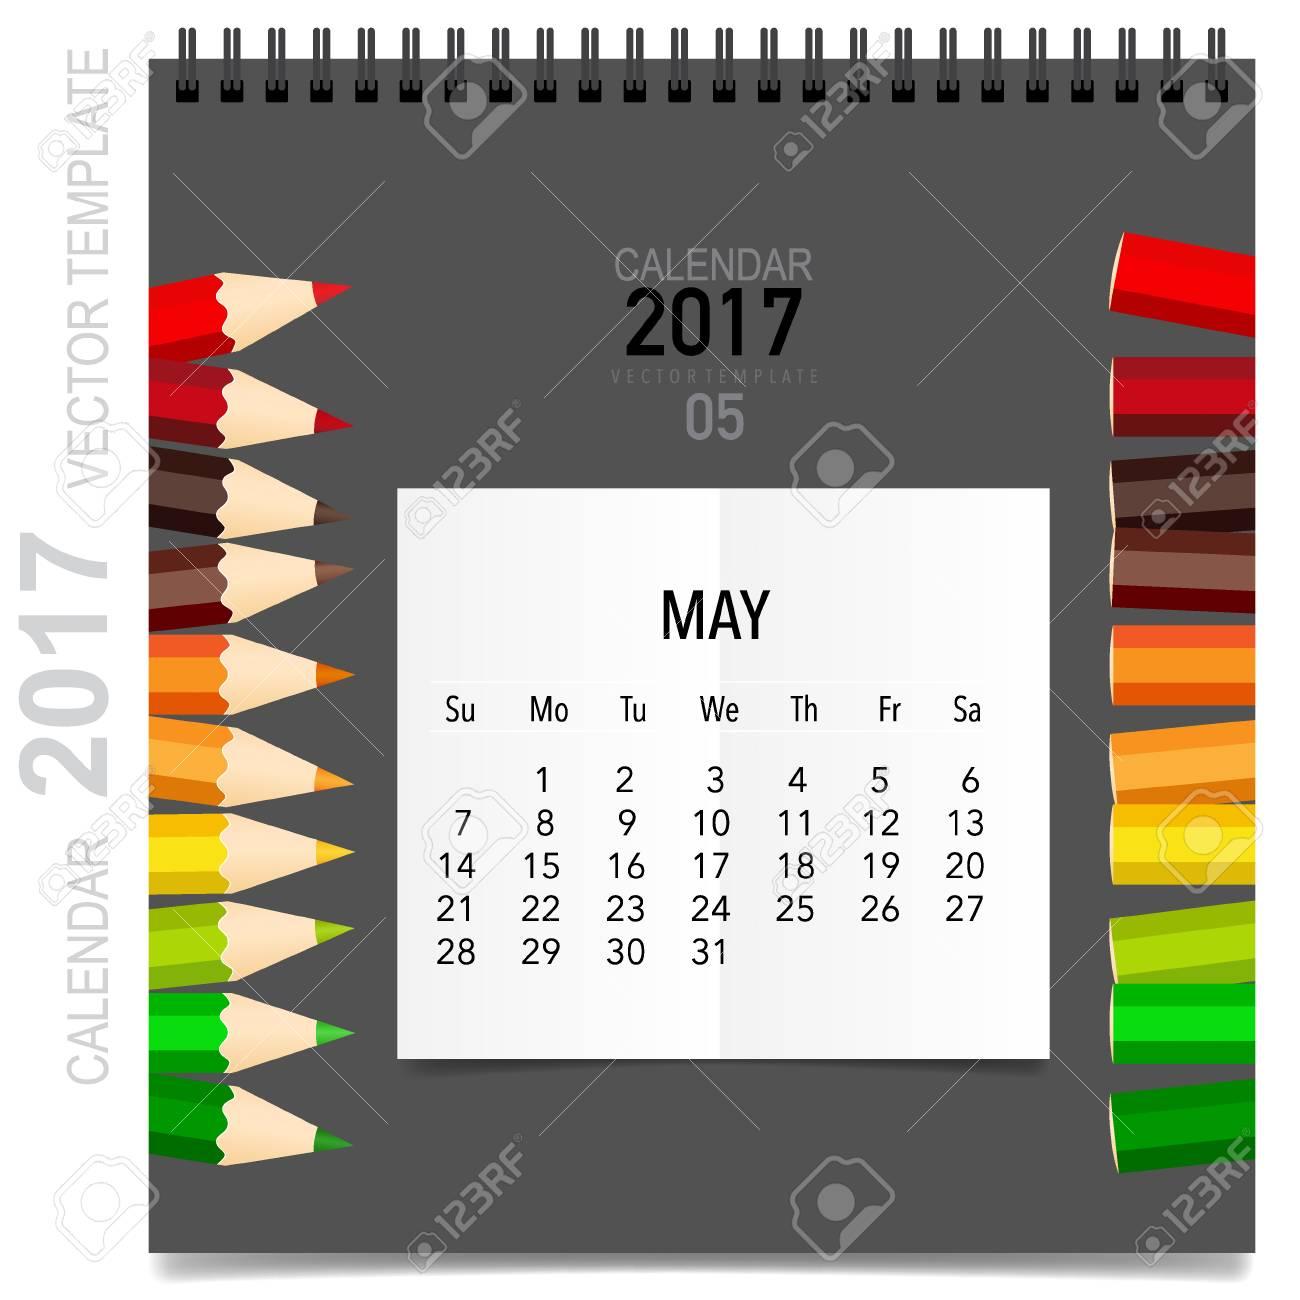 2017 Calendar Planner Design, Monthly Calendar Template For May ...